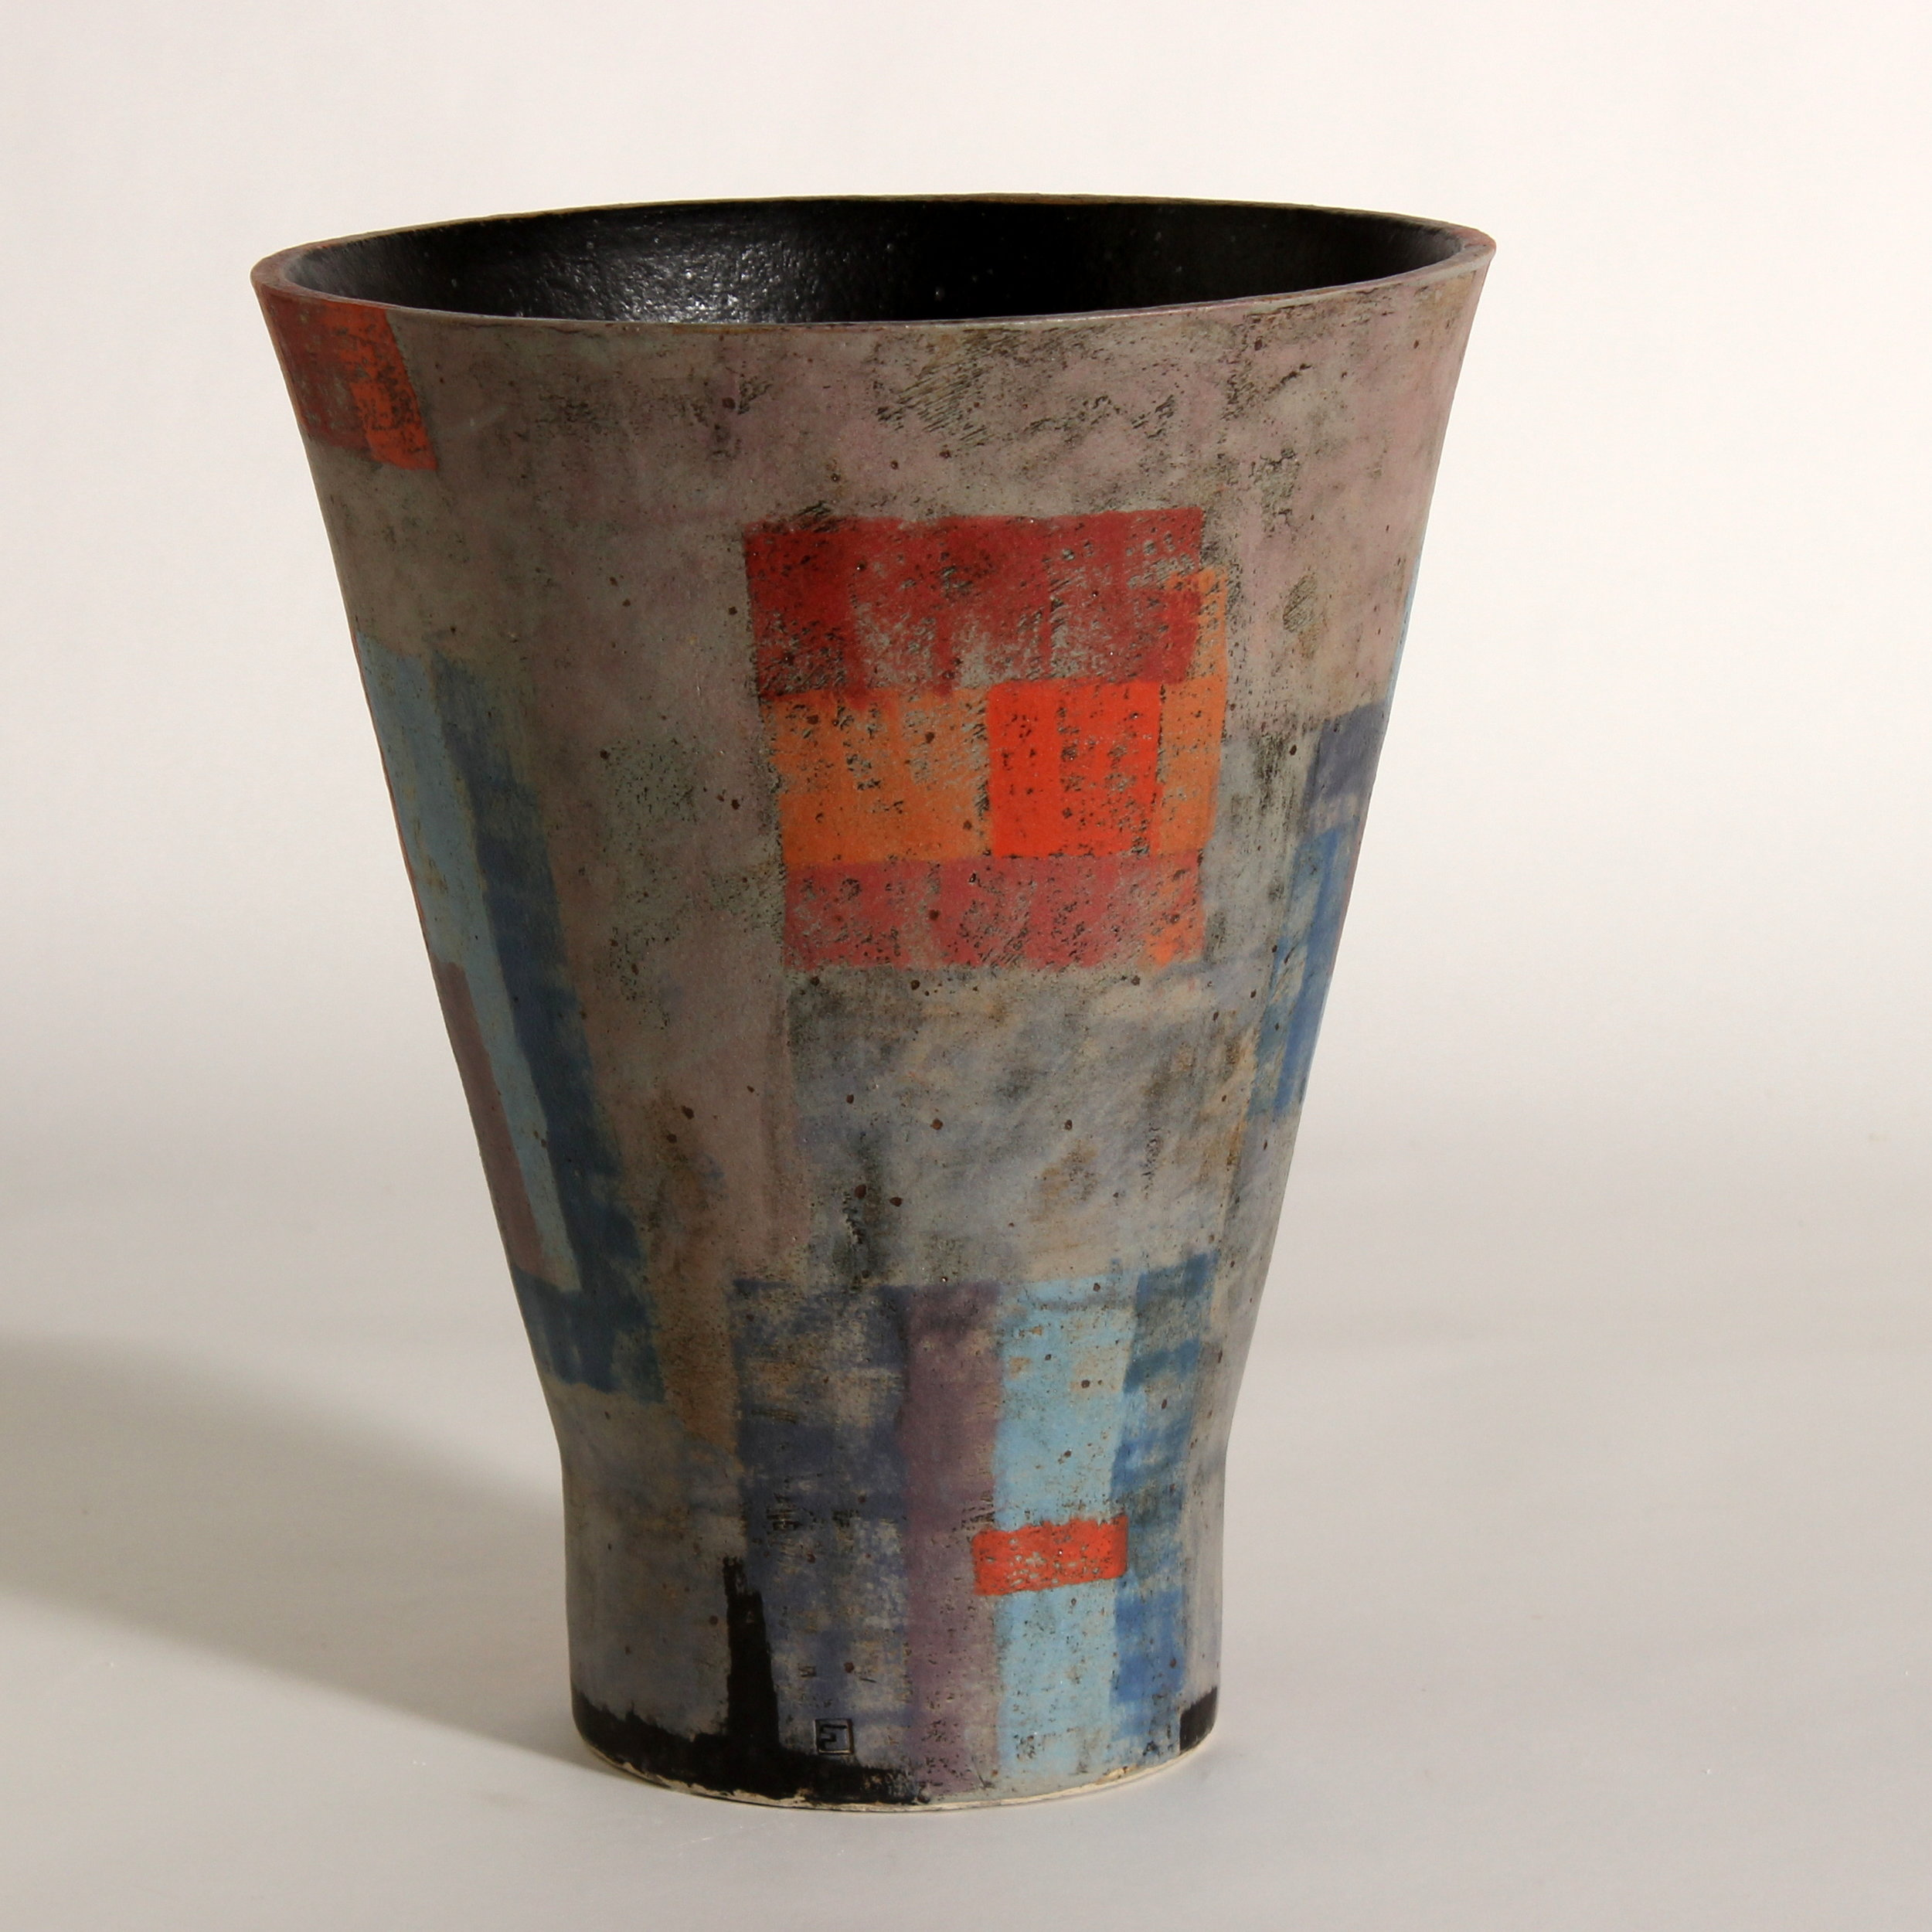 Tall vessel, cone form